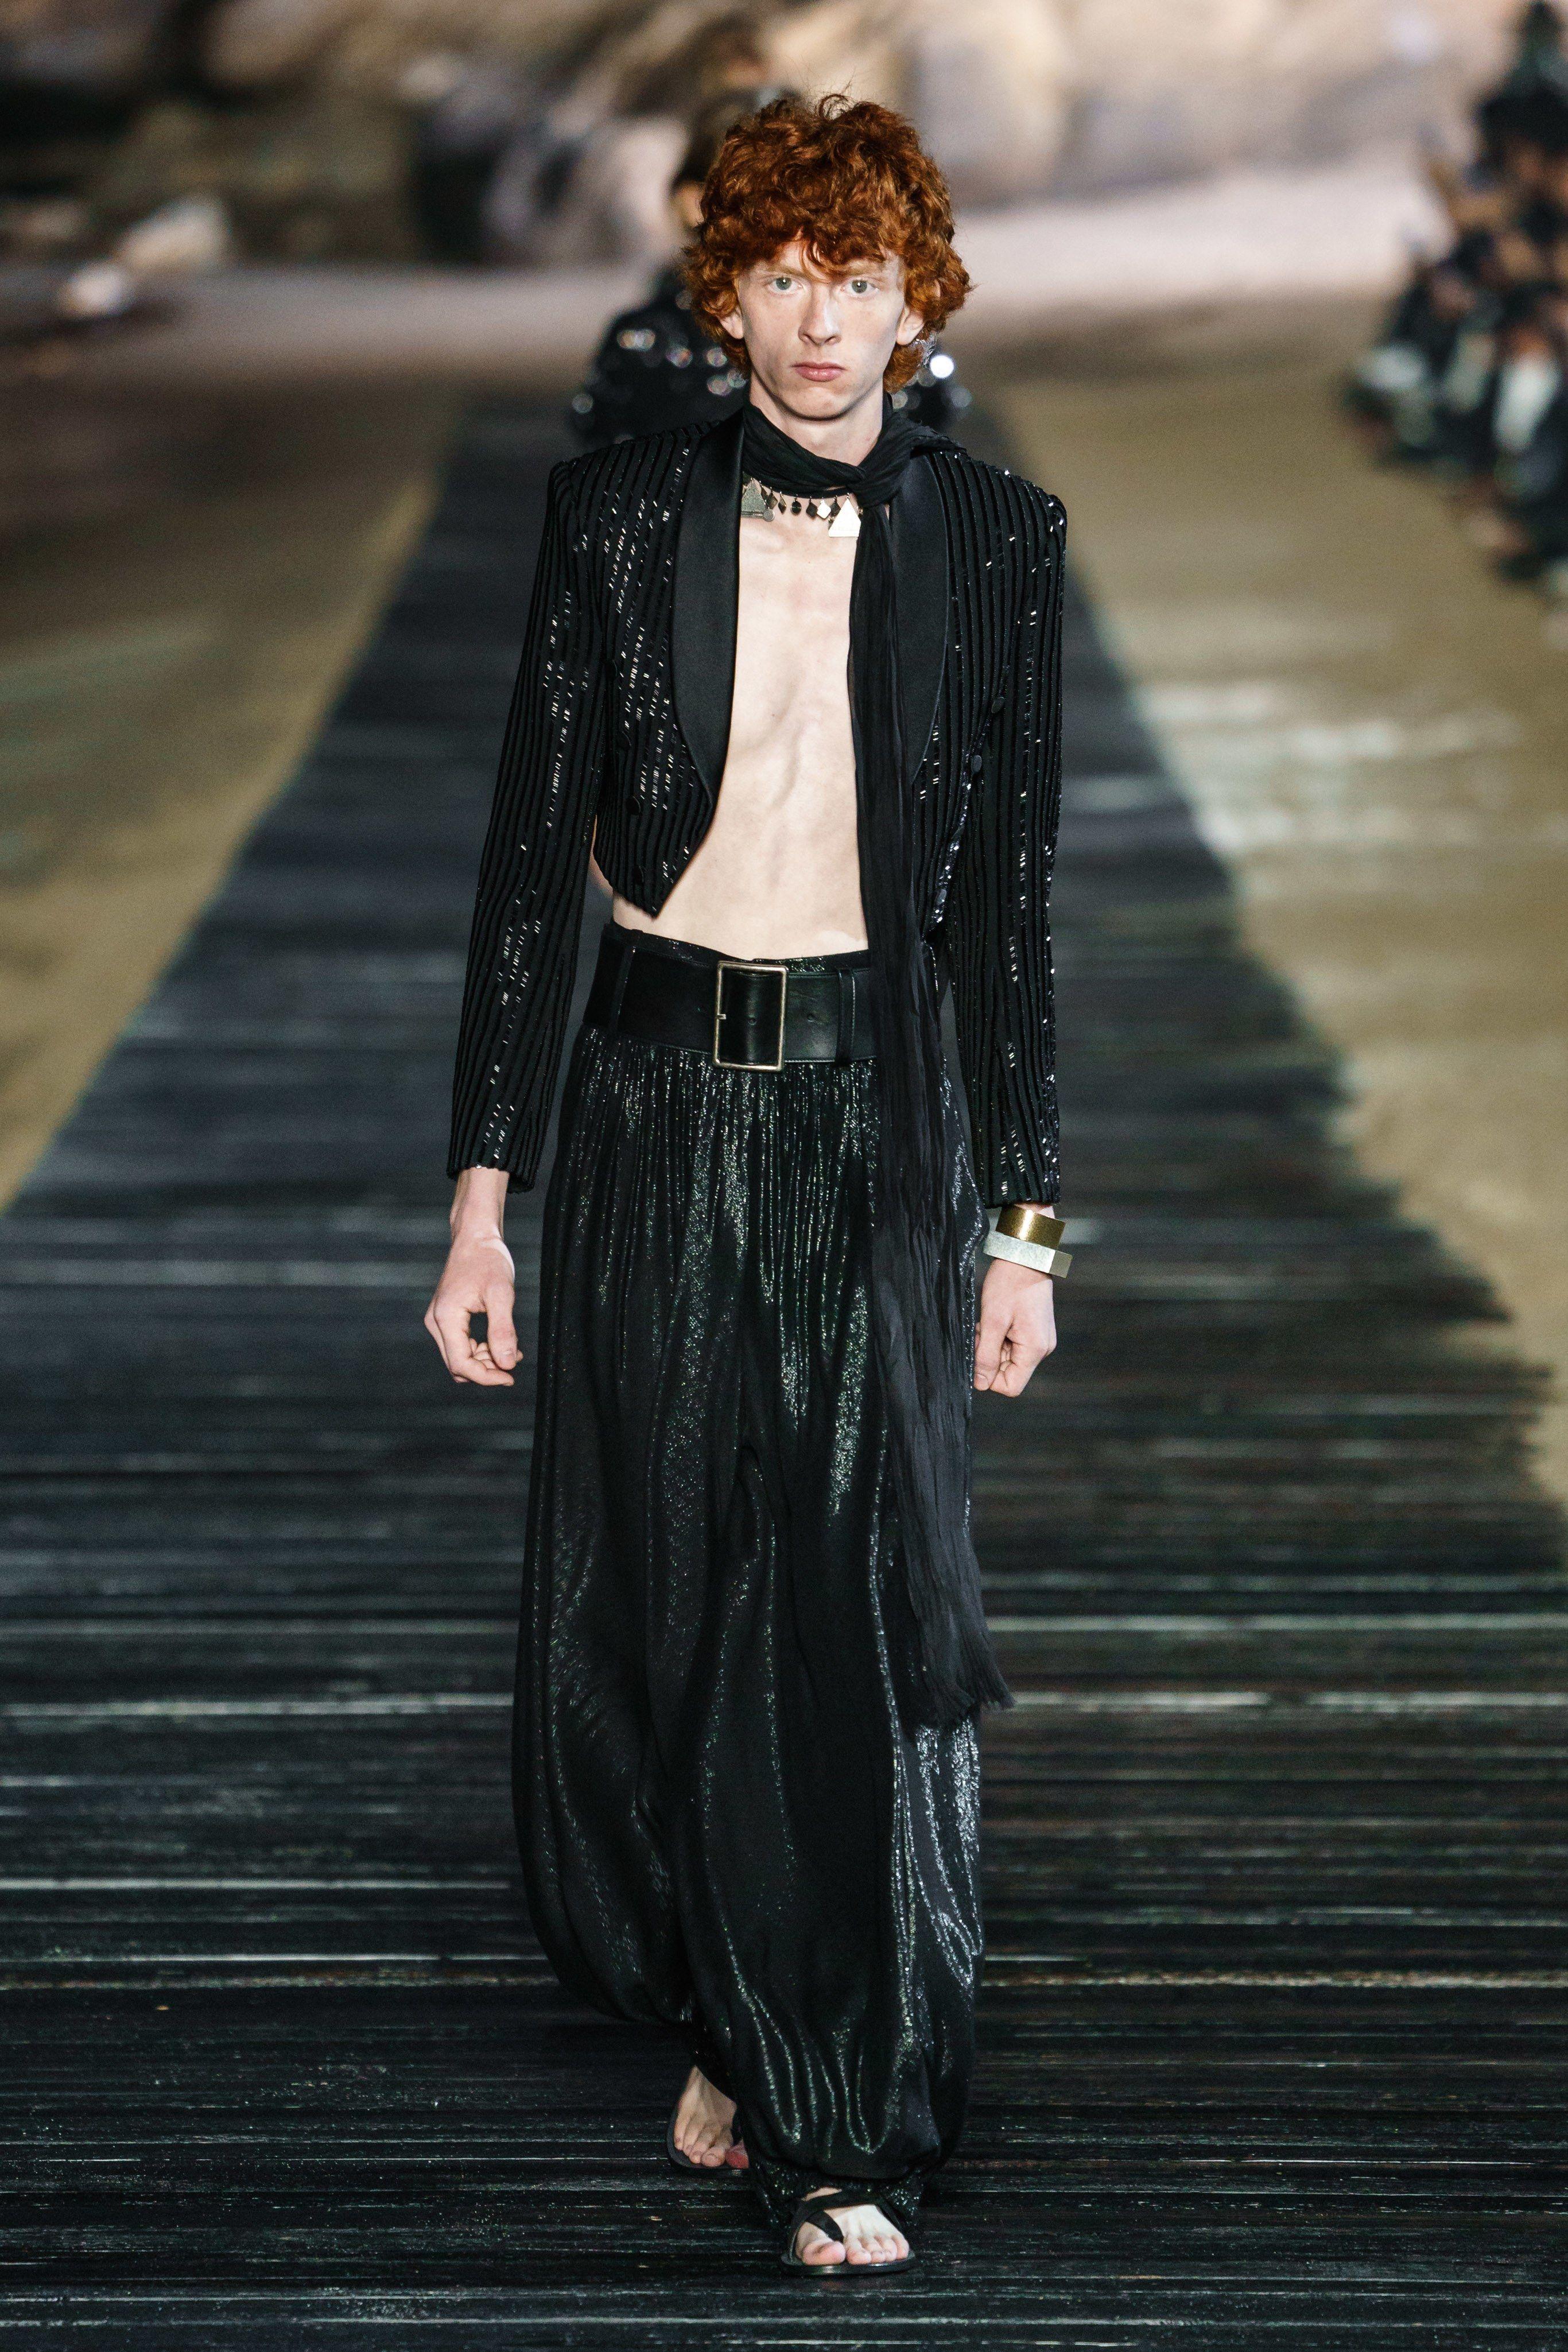 Saint Laurent Spring 2020 Menswear Fashion Show in 2020